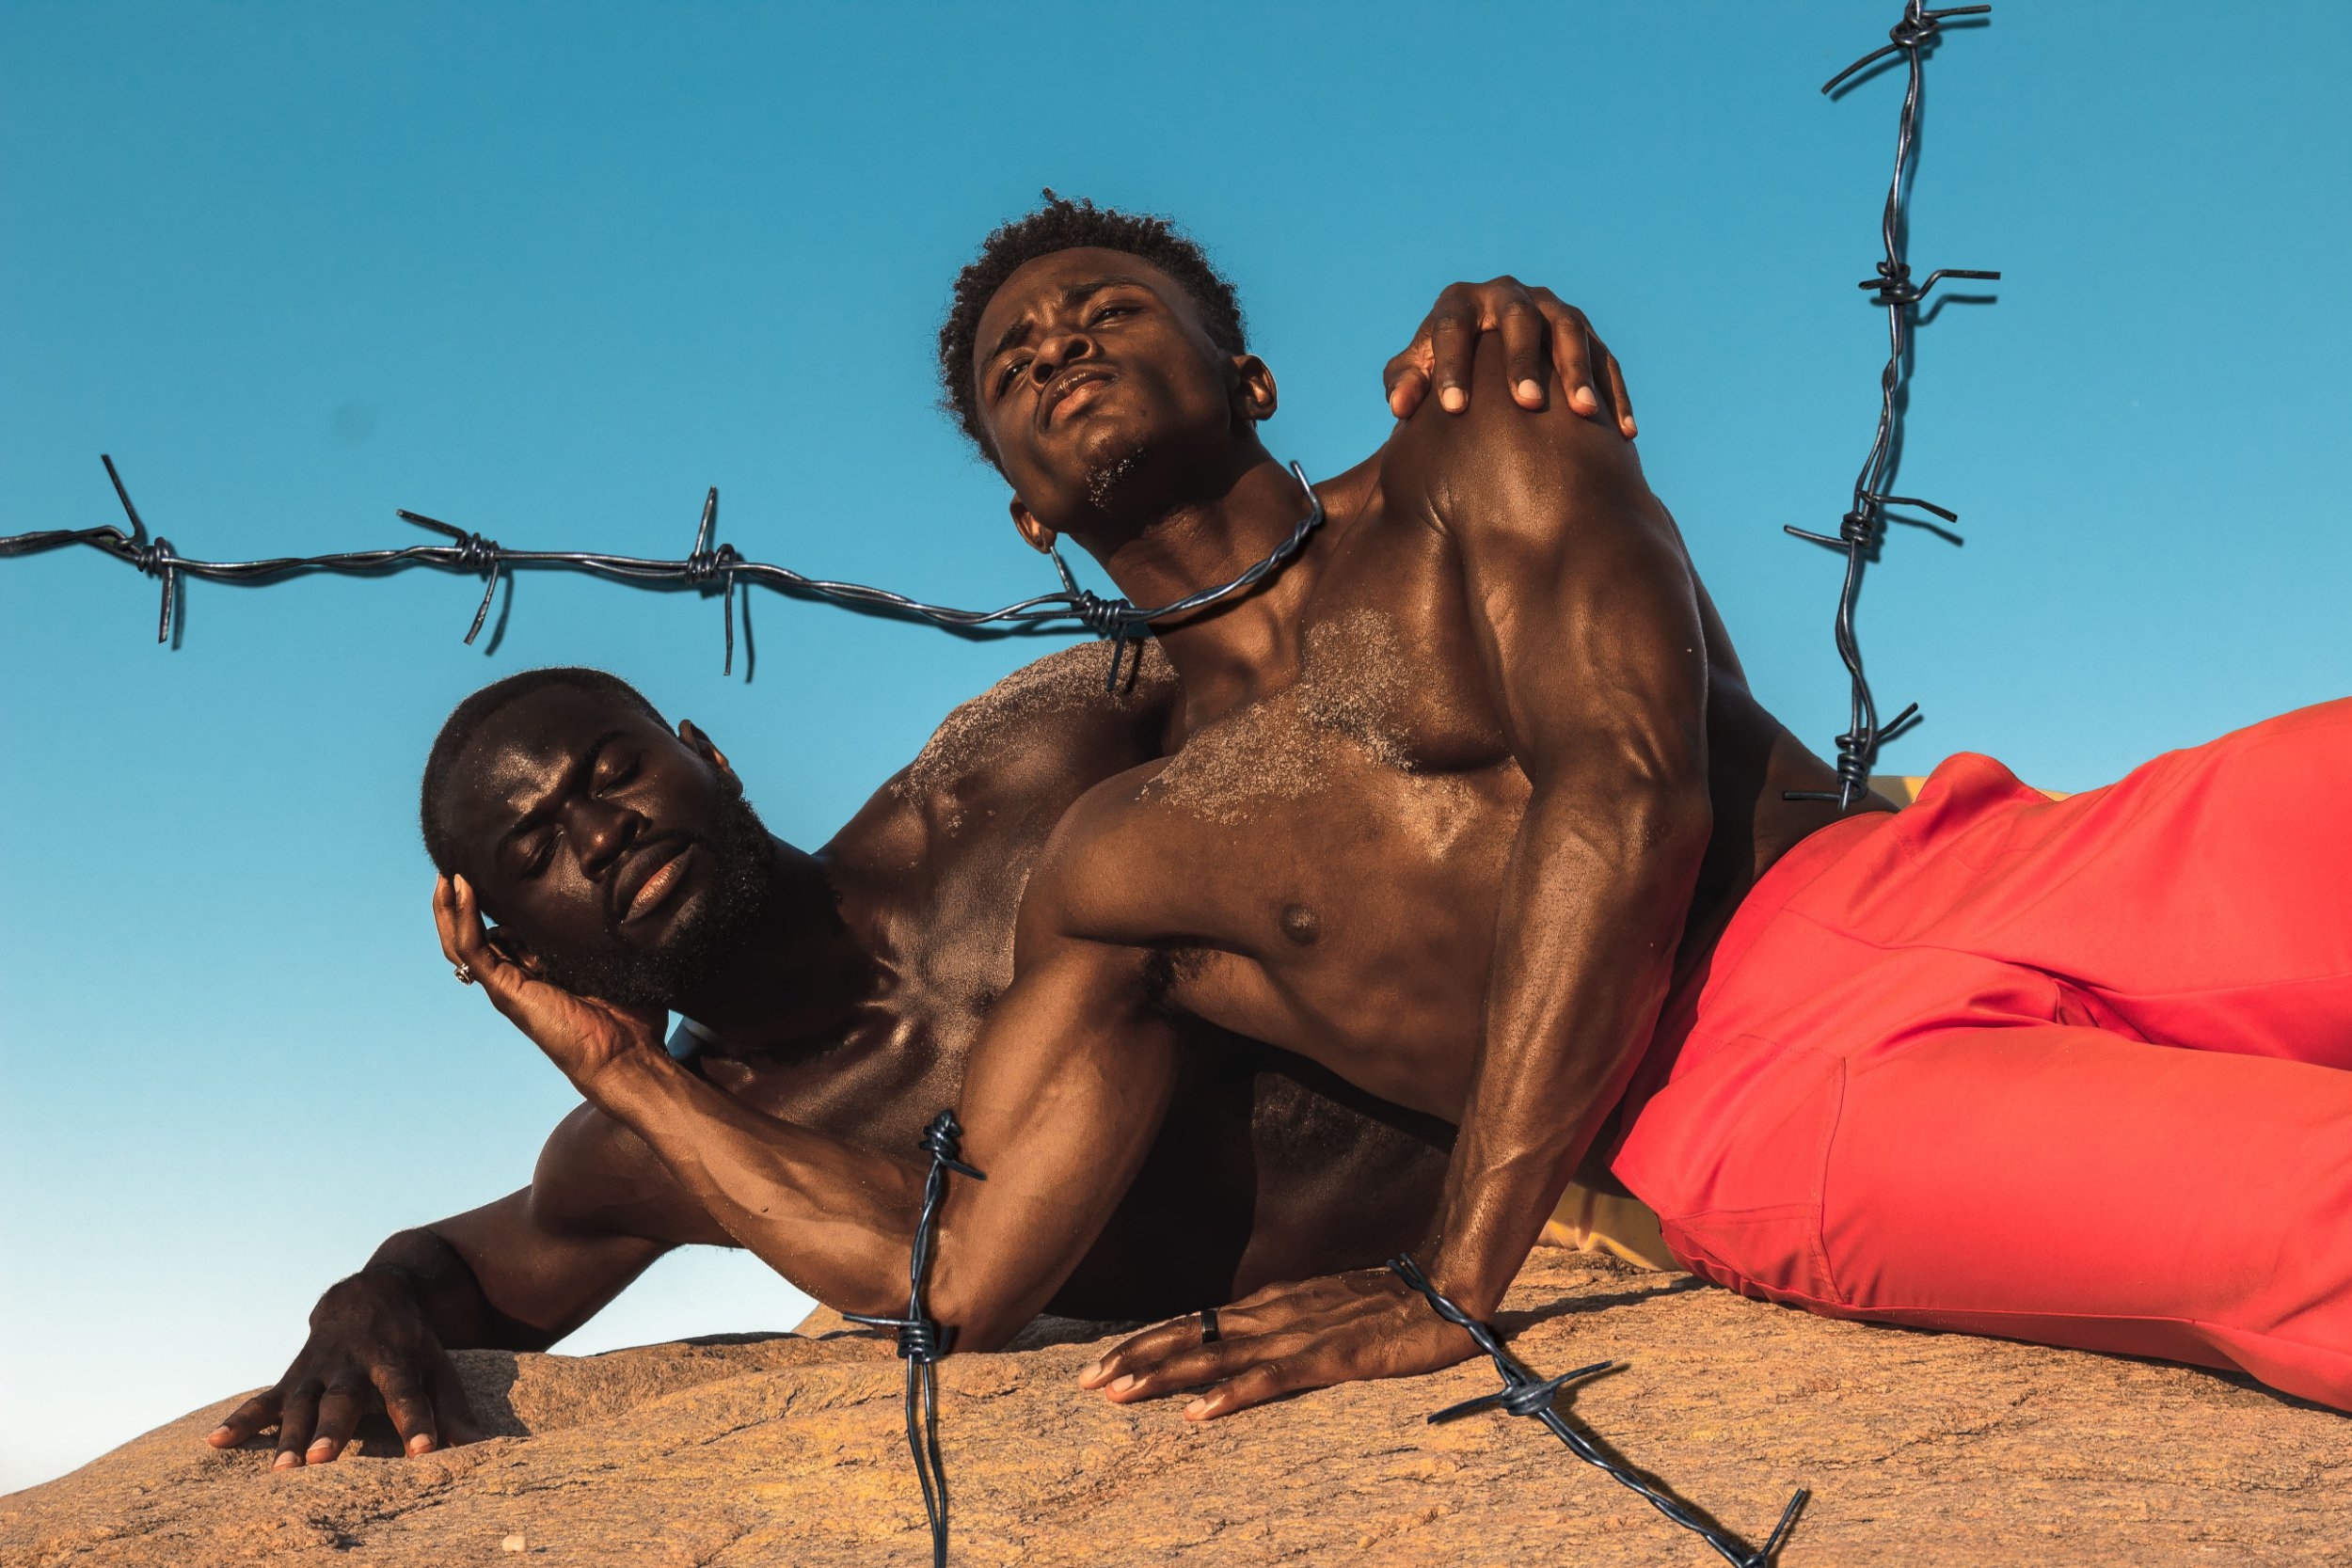 Photo Series Illustrates The Turmoil Of Mass Incarceration On Black Men